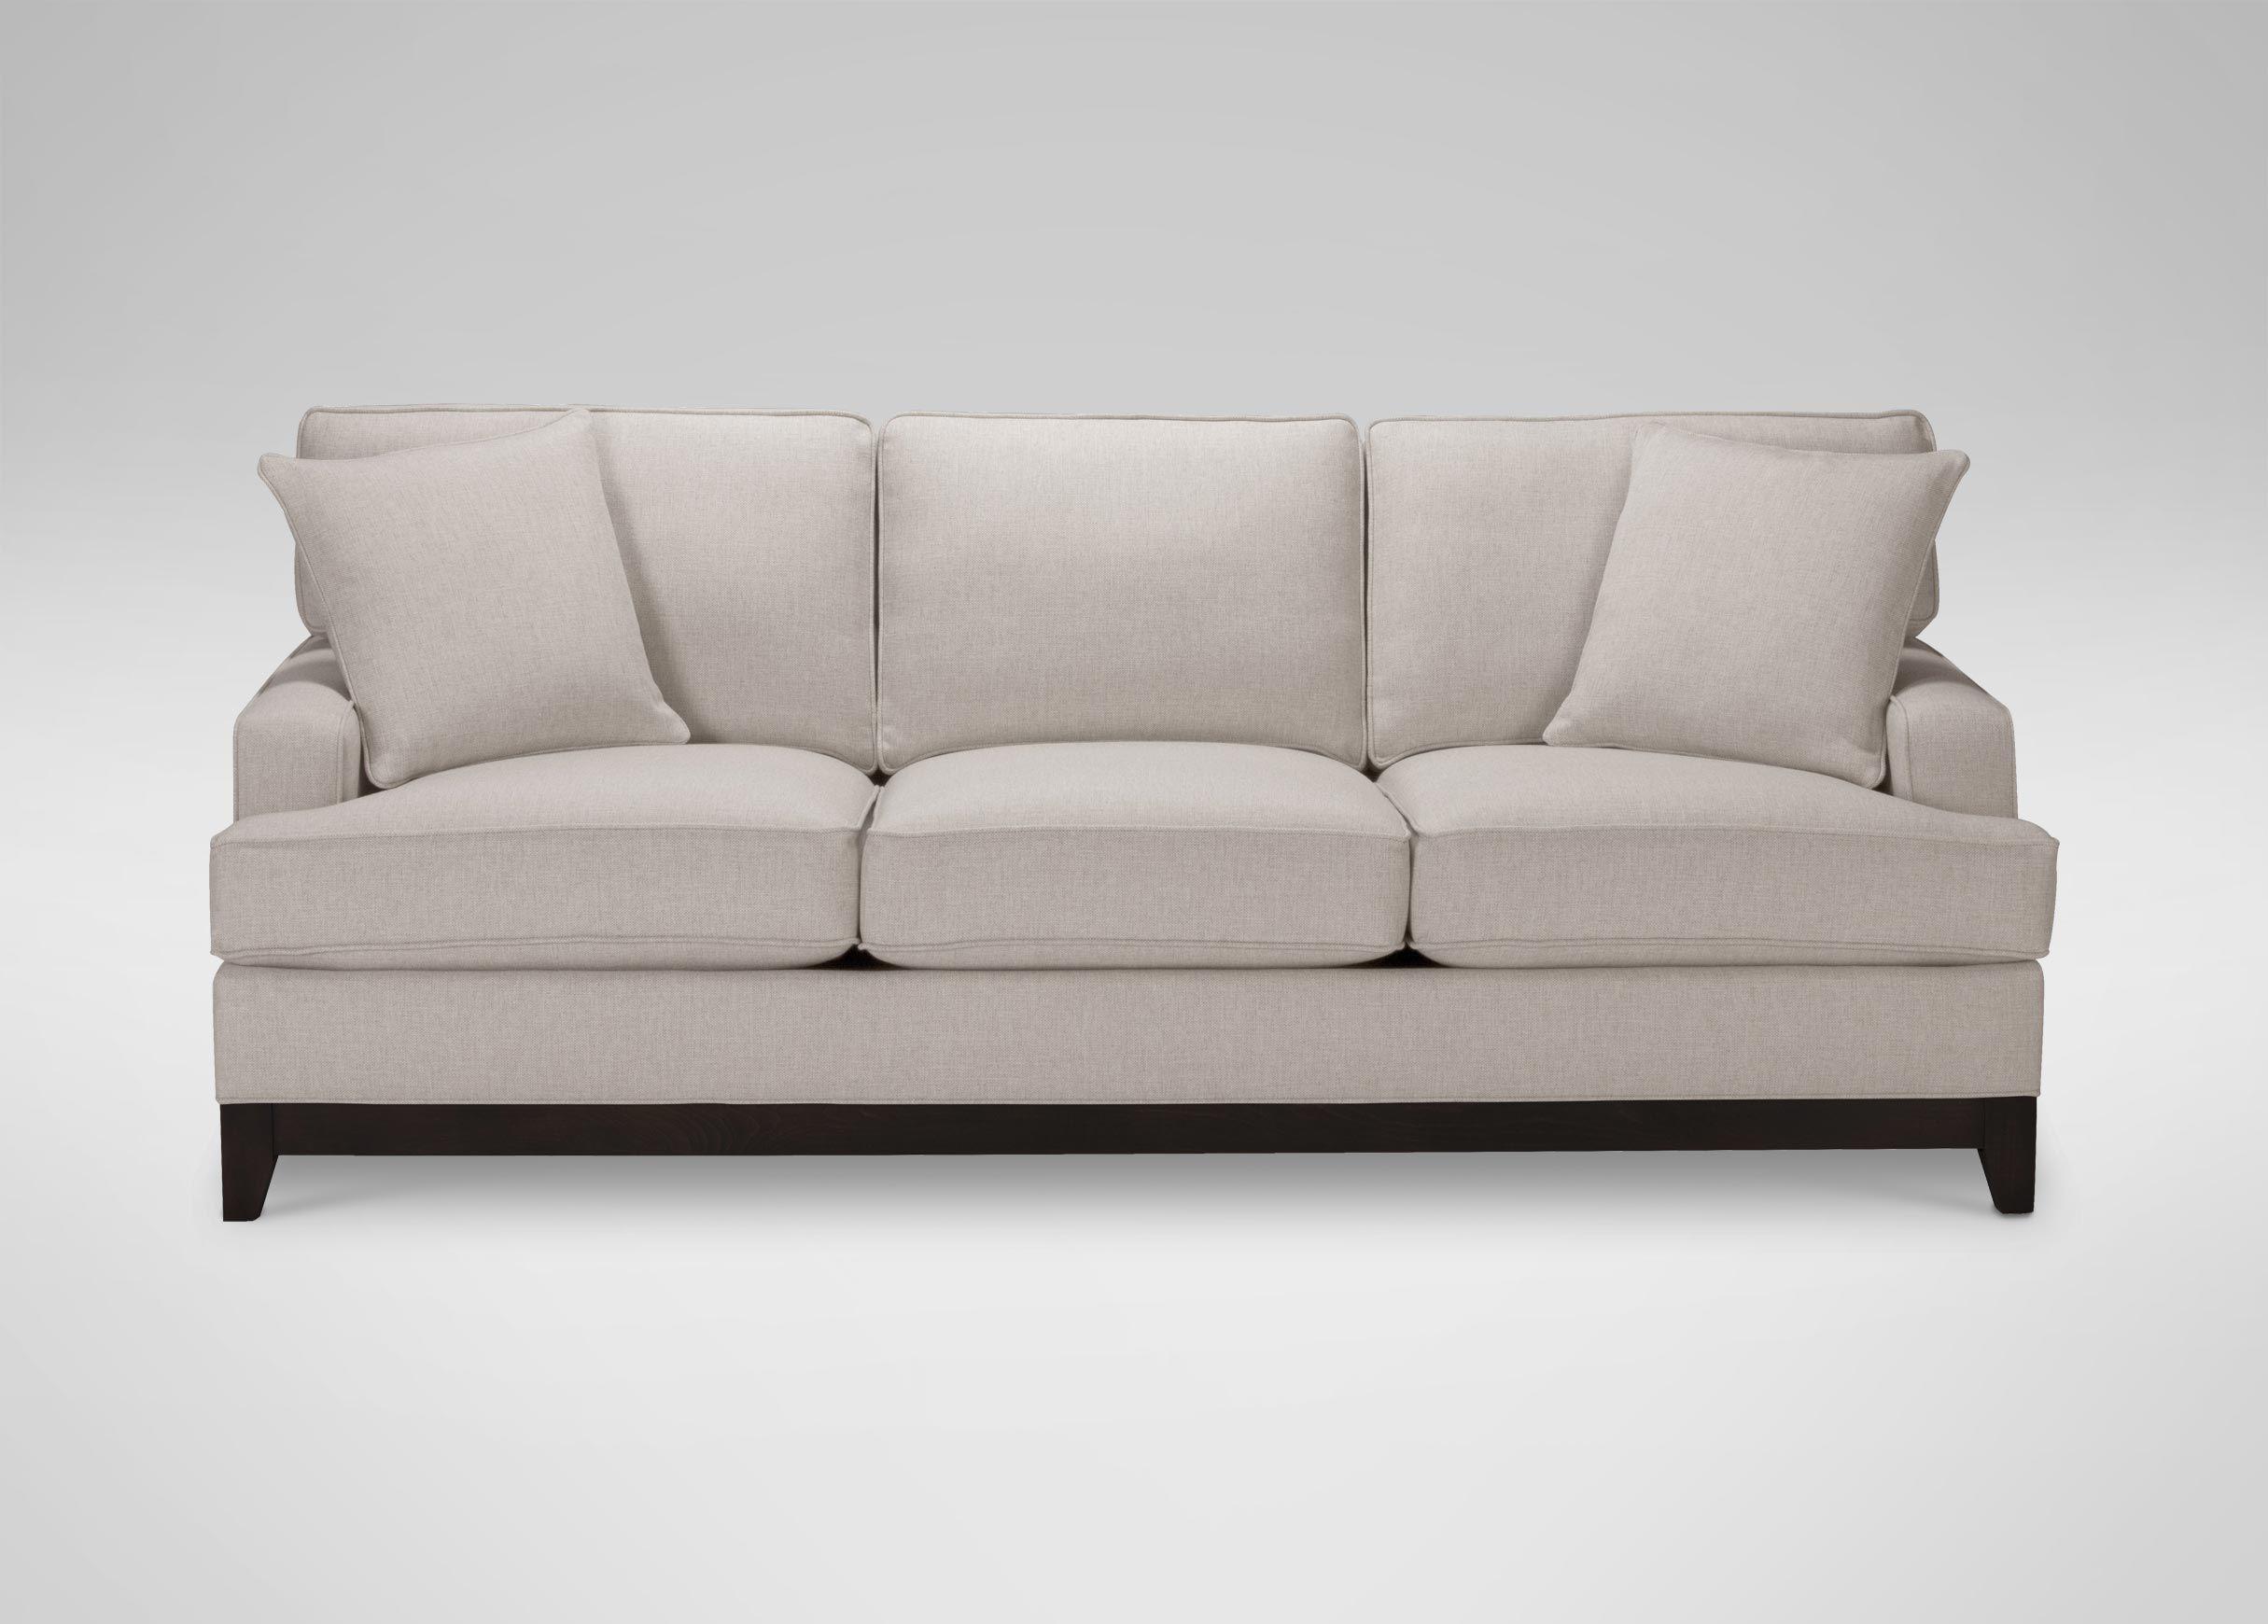 Fabulous Arcata Sofa Quick Ship Oak Street Living Room Sofa Home Interior And Landscaping Ologienasavecom